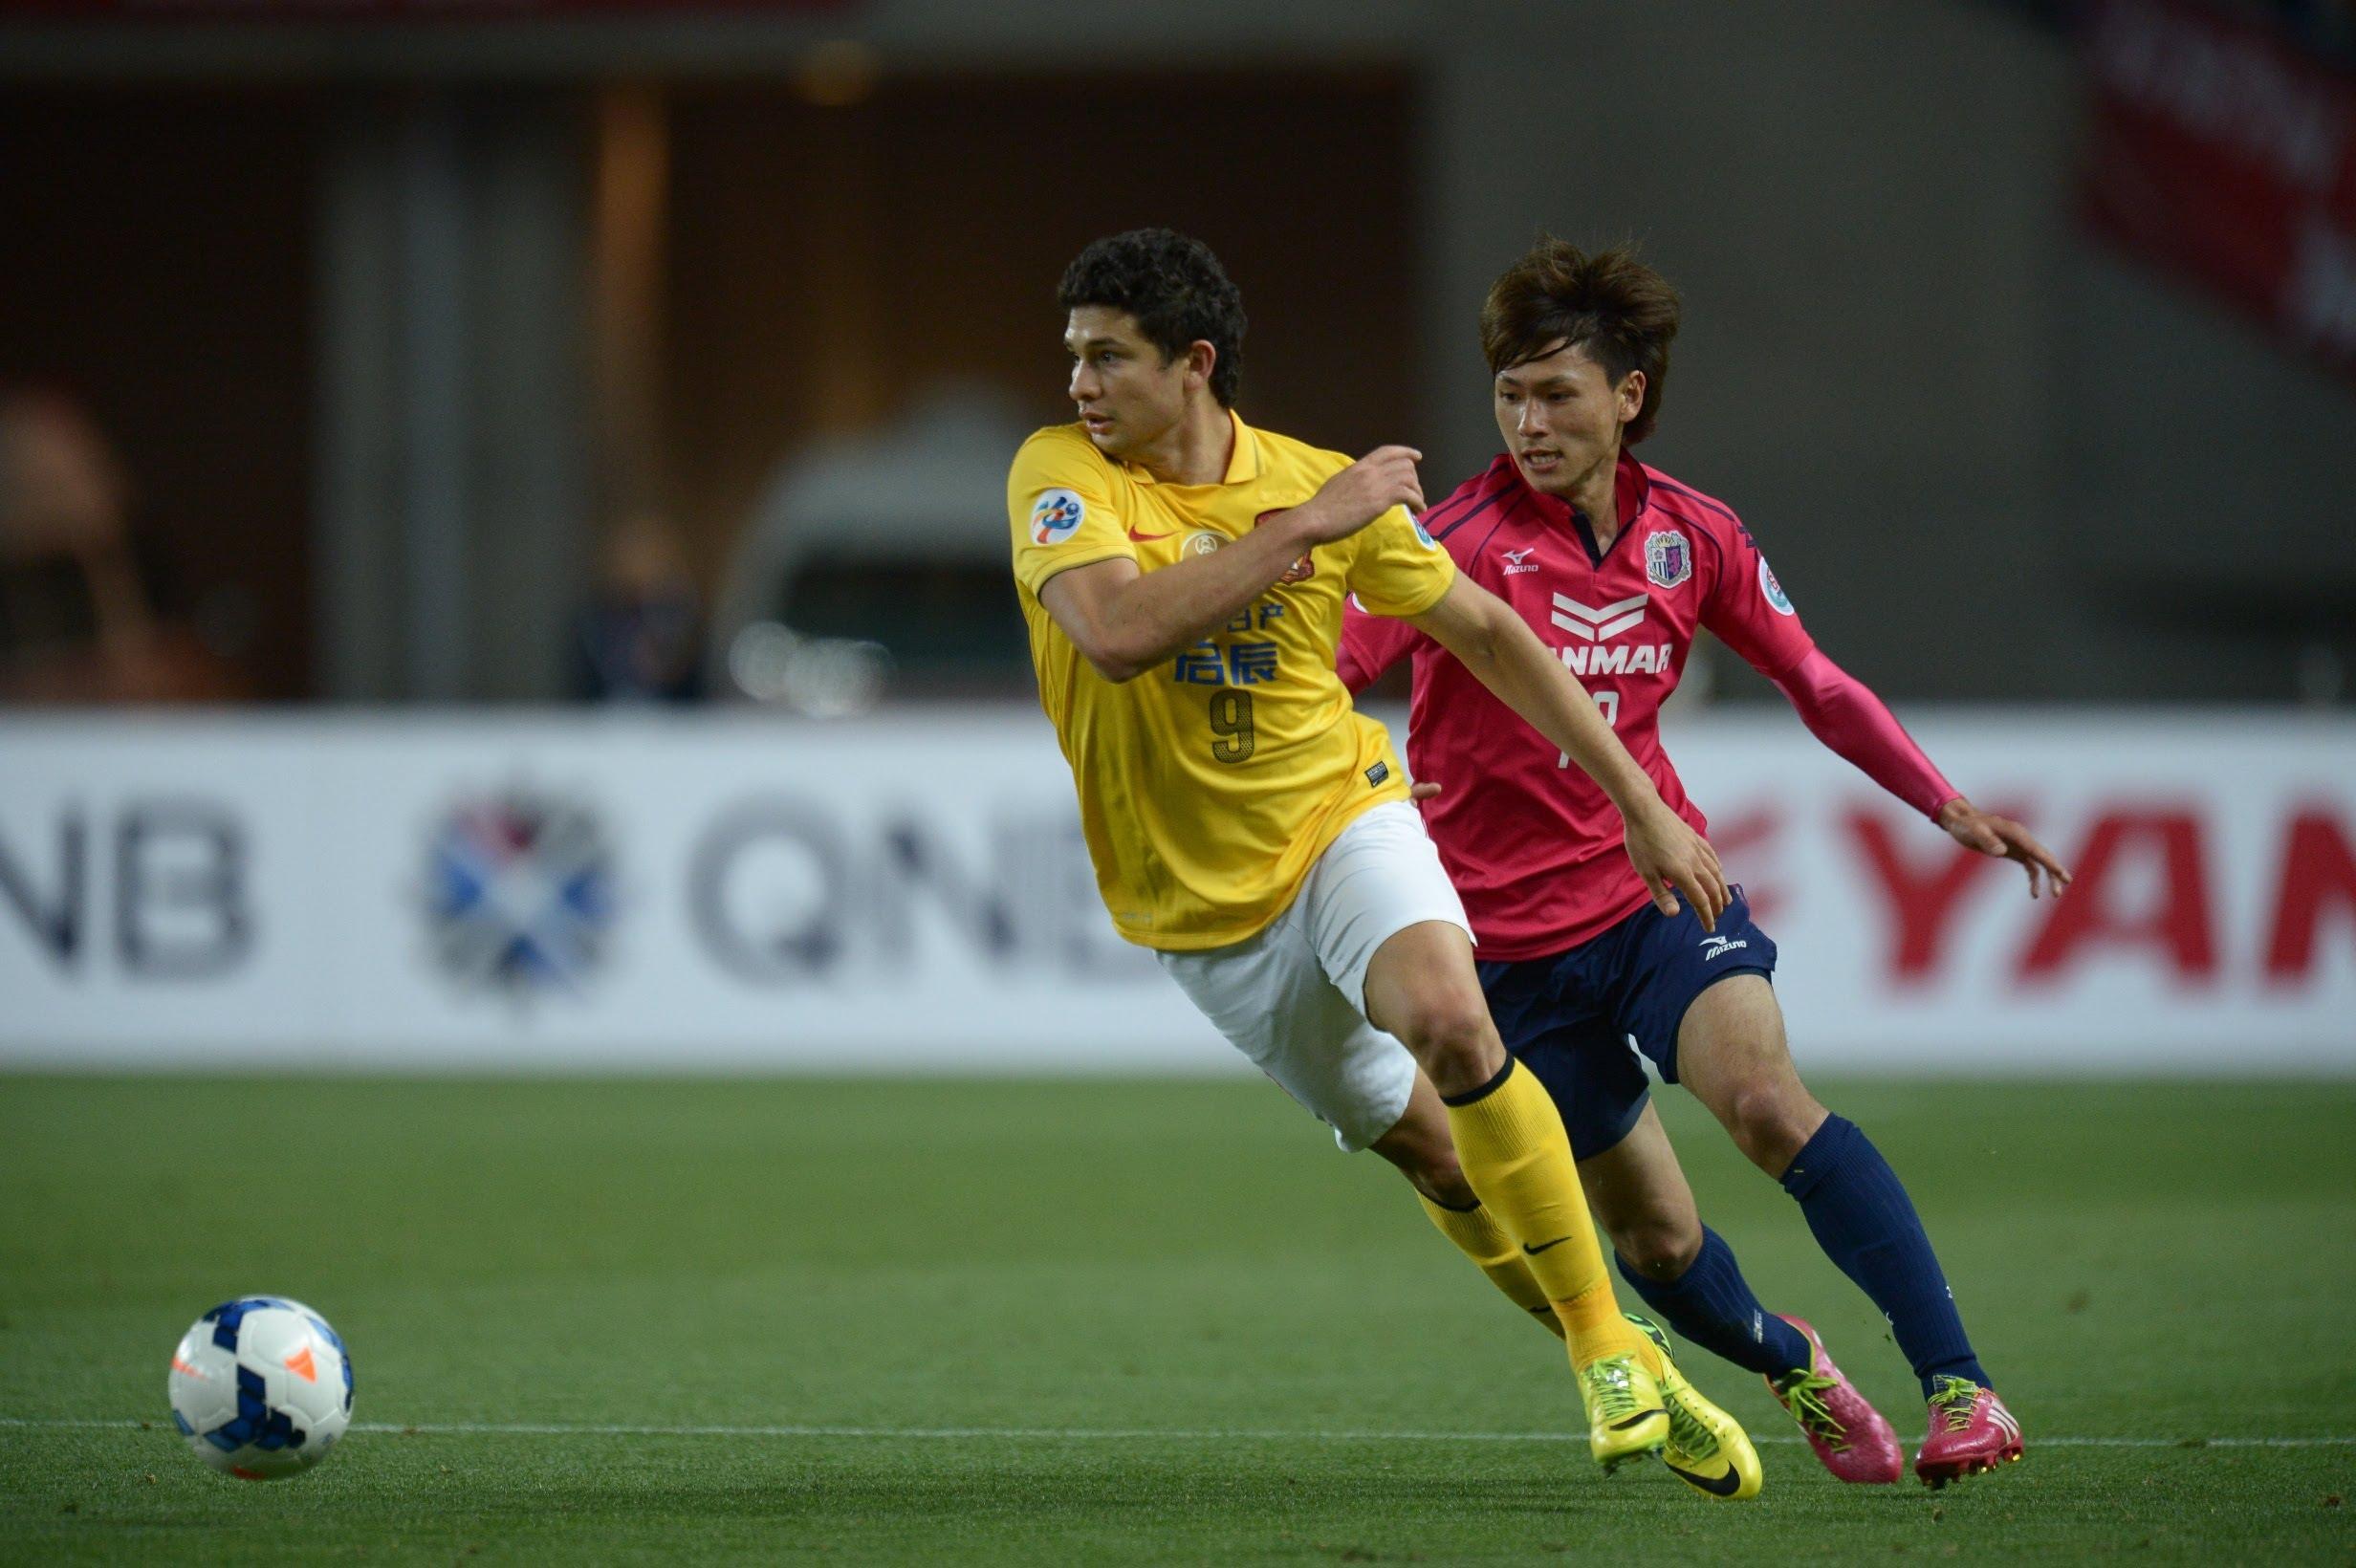 Guangzhou Evergrande vs Cezero Osaka